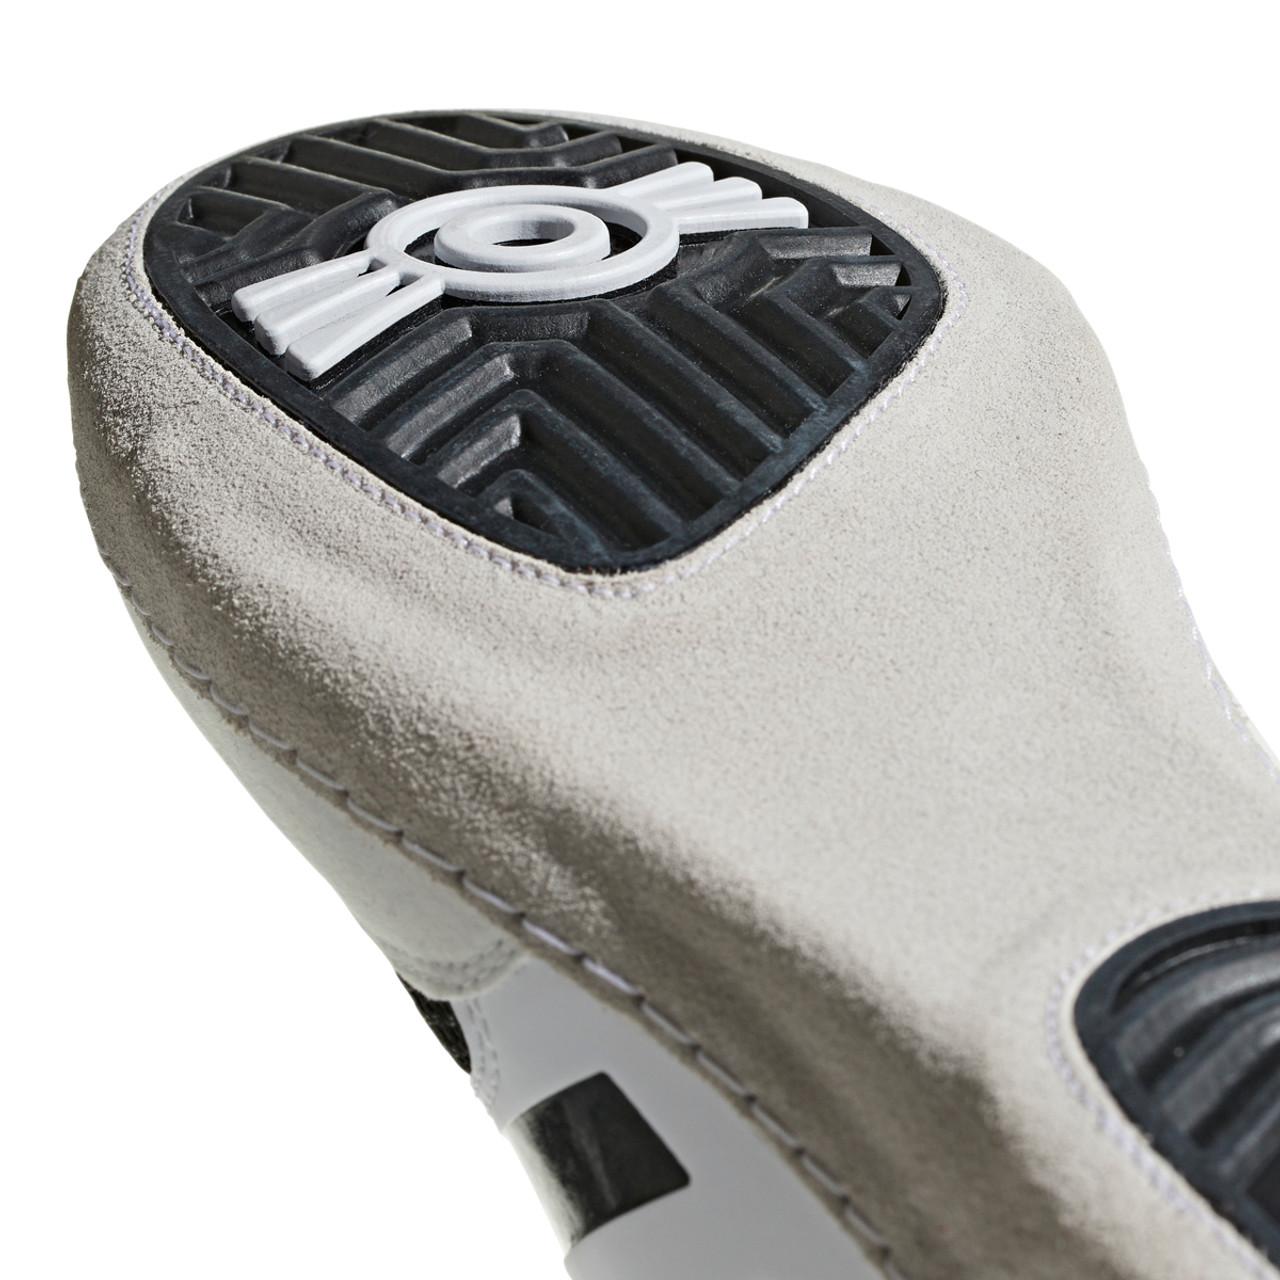 51d5b19ce70 Adidas Combat Speed 5 Men s Wrestling Shoes AC7501 - White